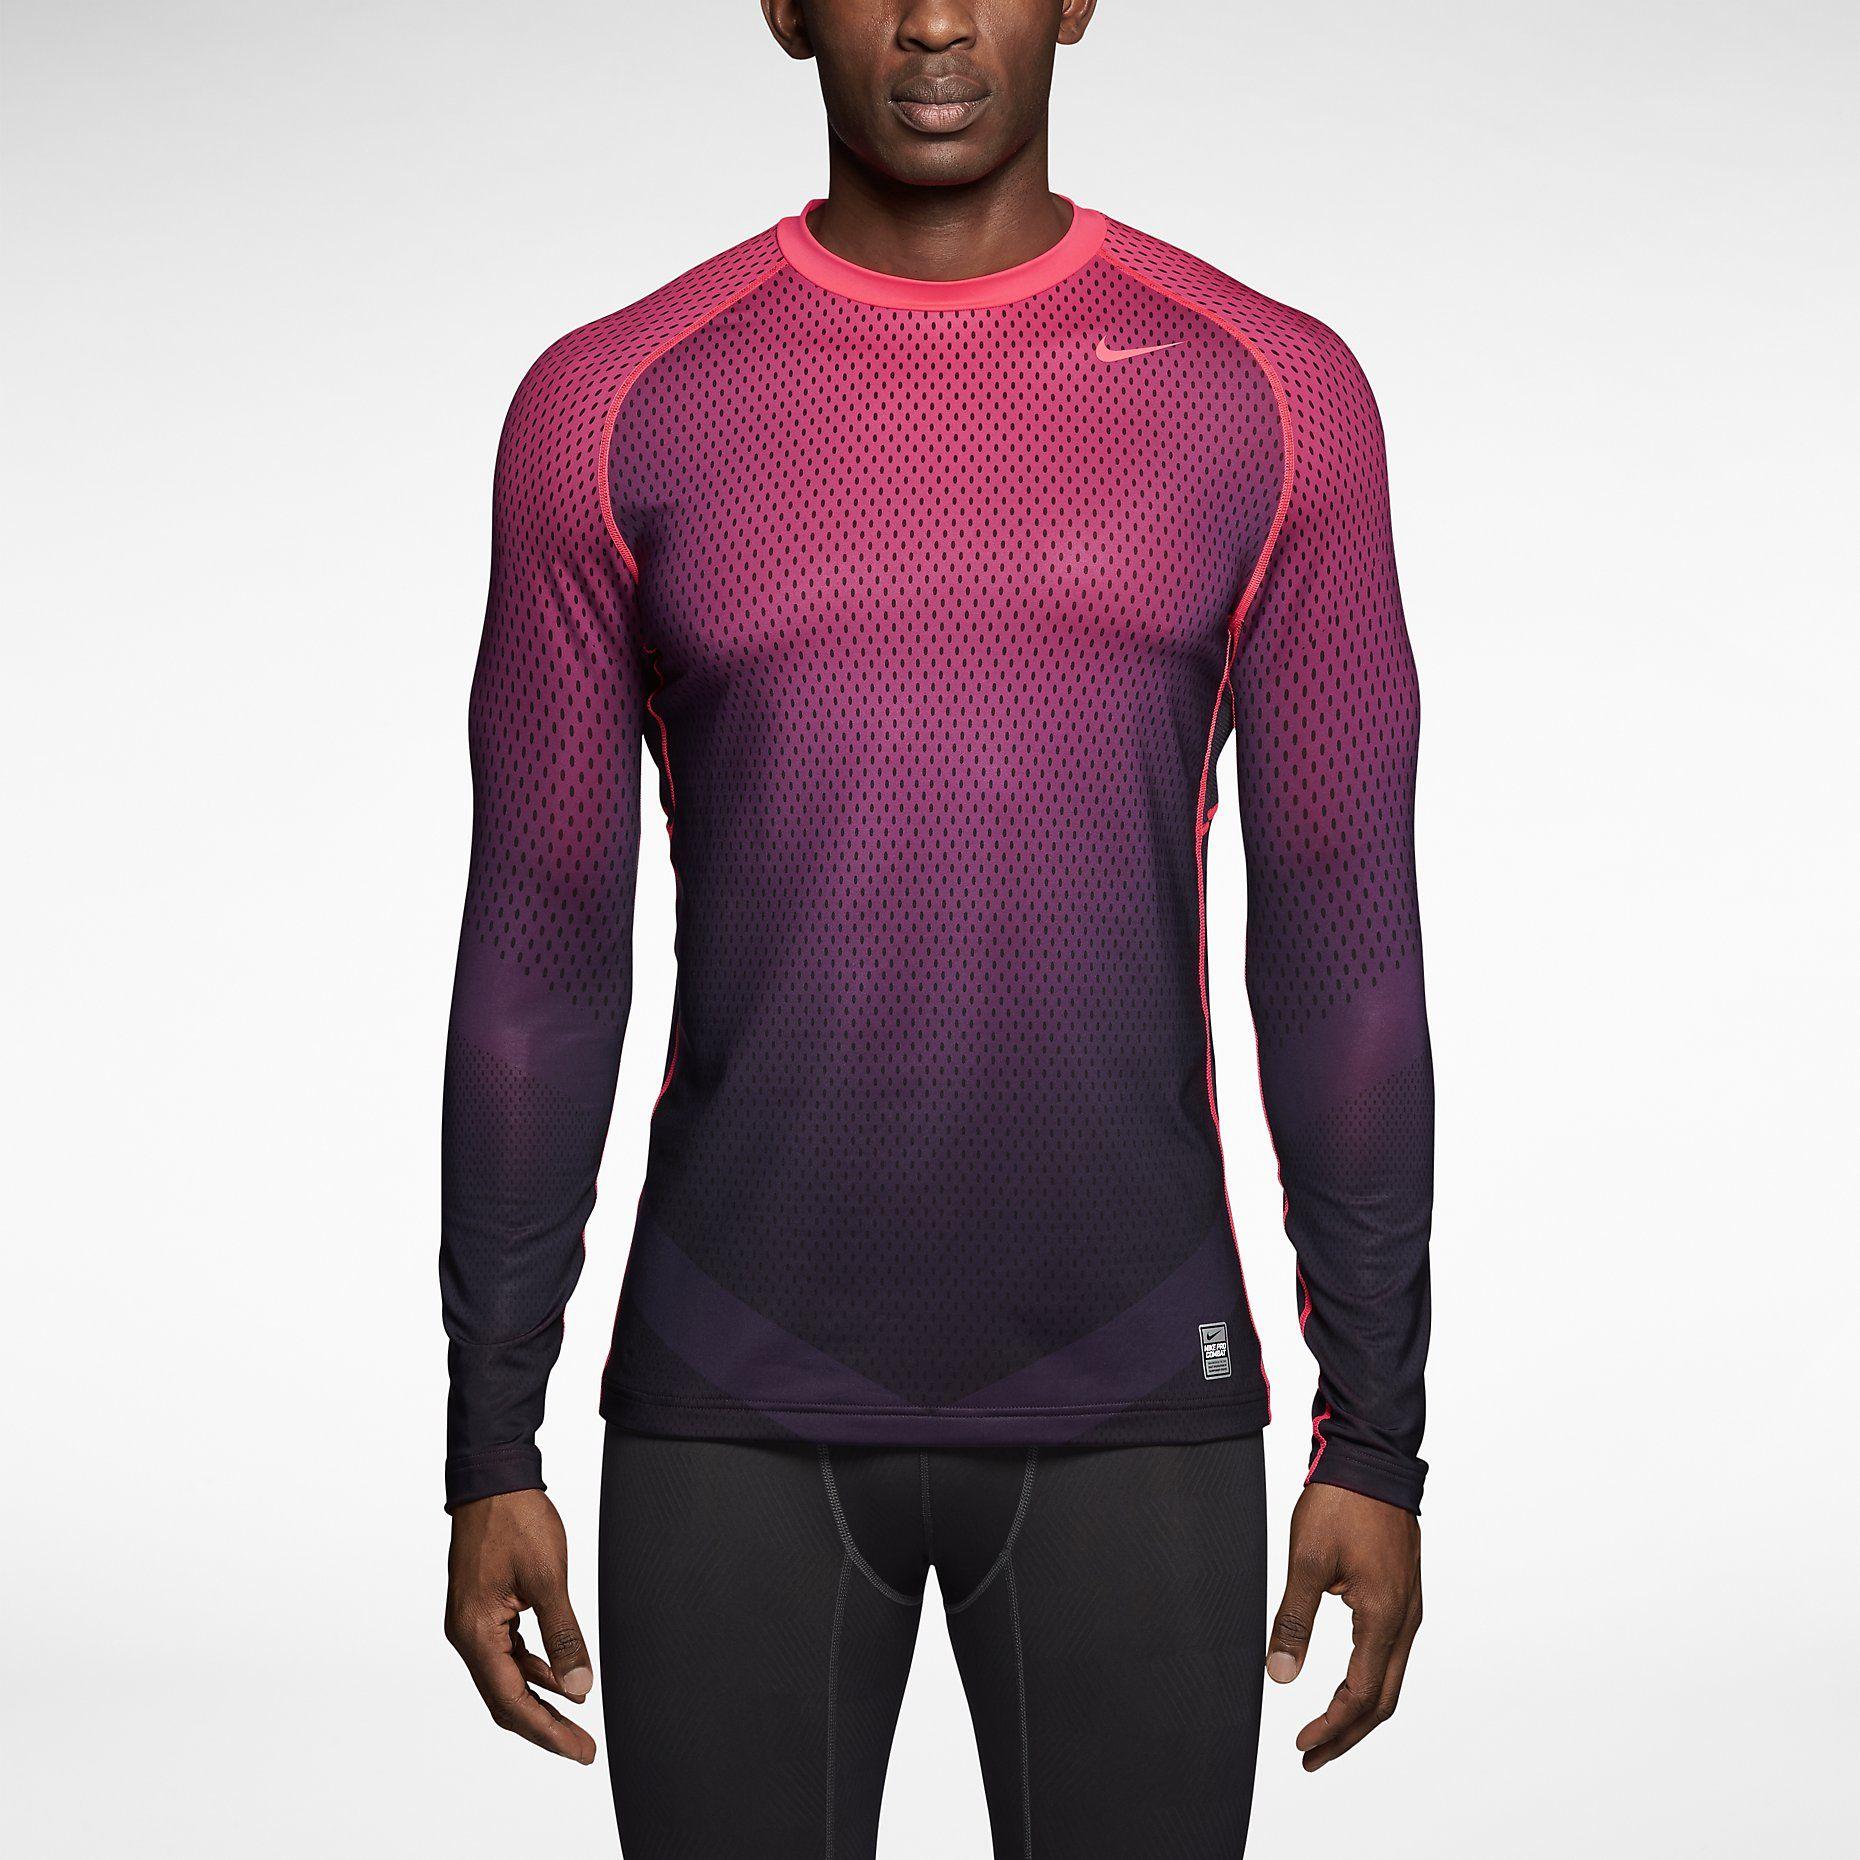 587f2813392a Nike Mens Pro Combat Long Sleeve Compression Shirt - BCD Tofu House